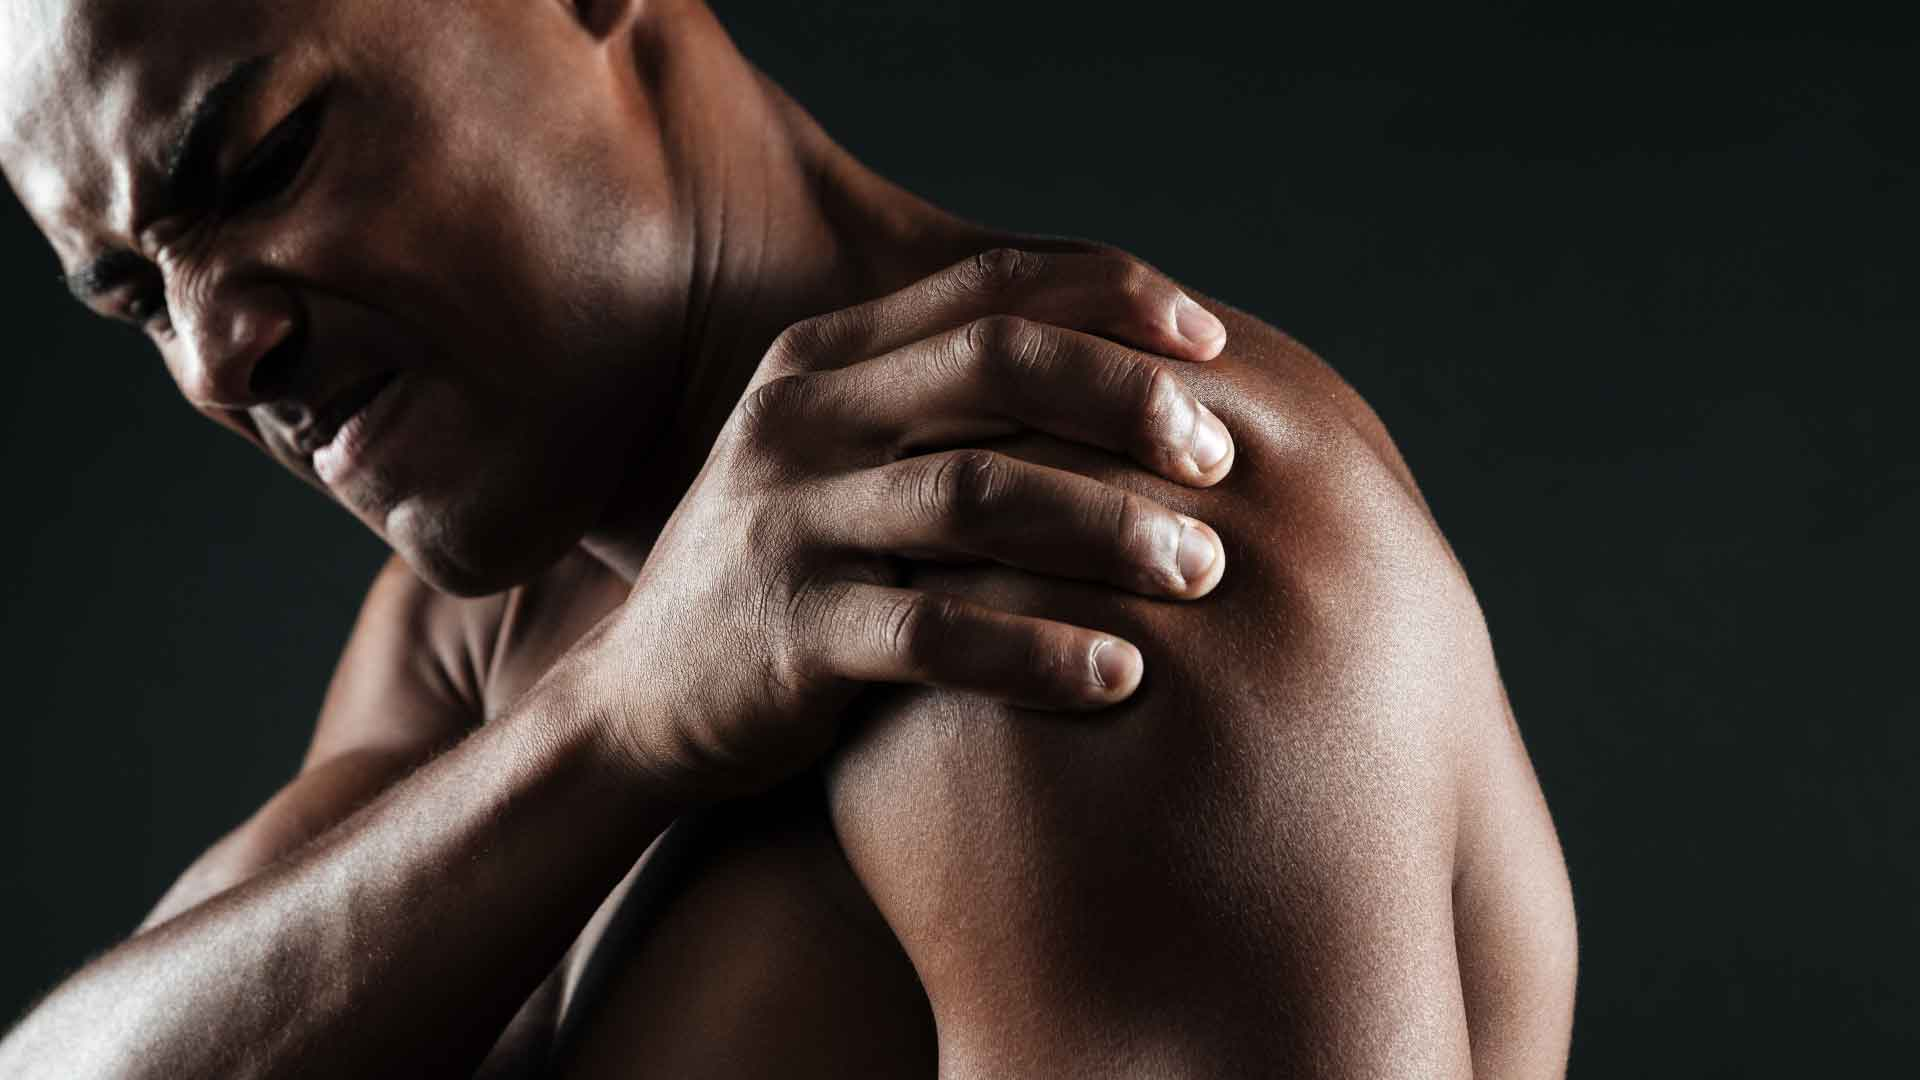 shoulder impingement exercises to avoid